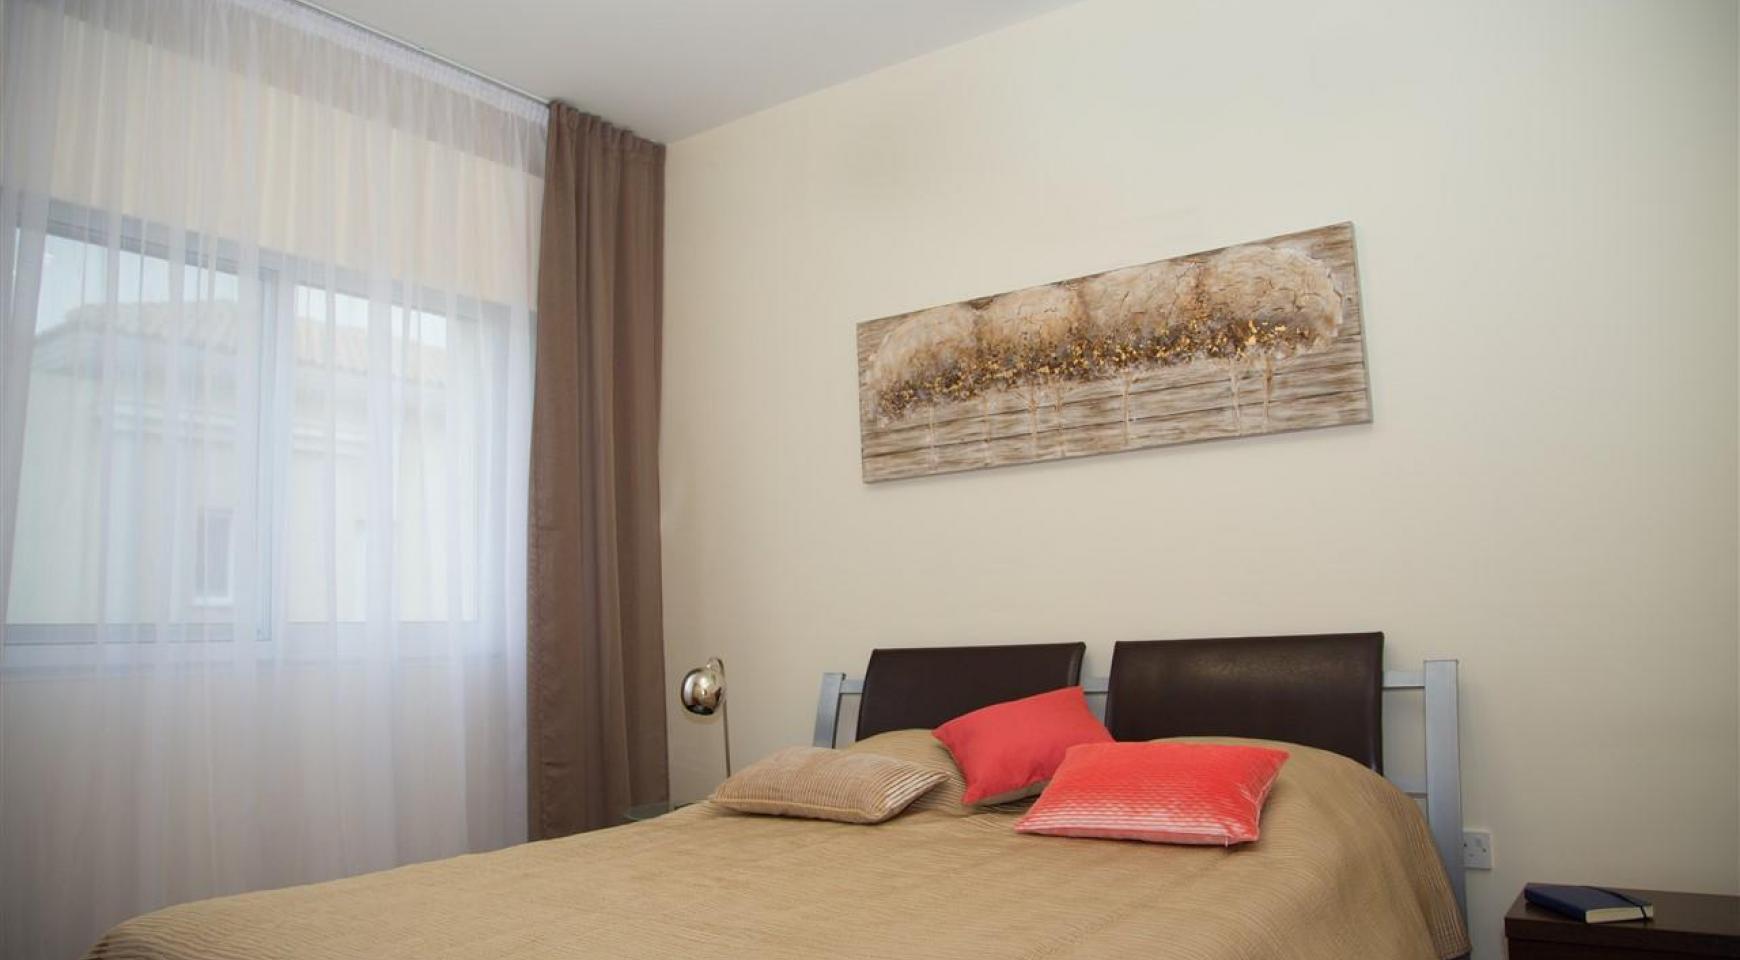 Luxury 2 Bedroom Apartment Mesogios Iris 304 in the Tourist area near the Beach - 17